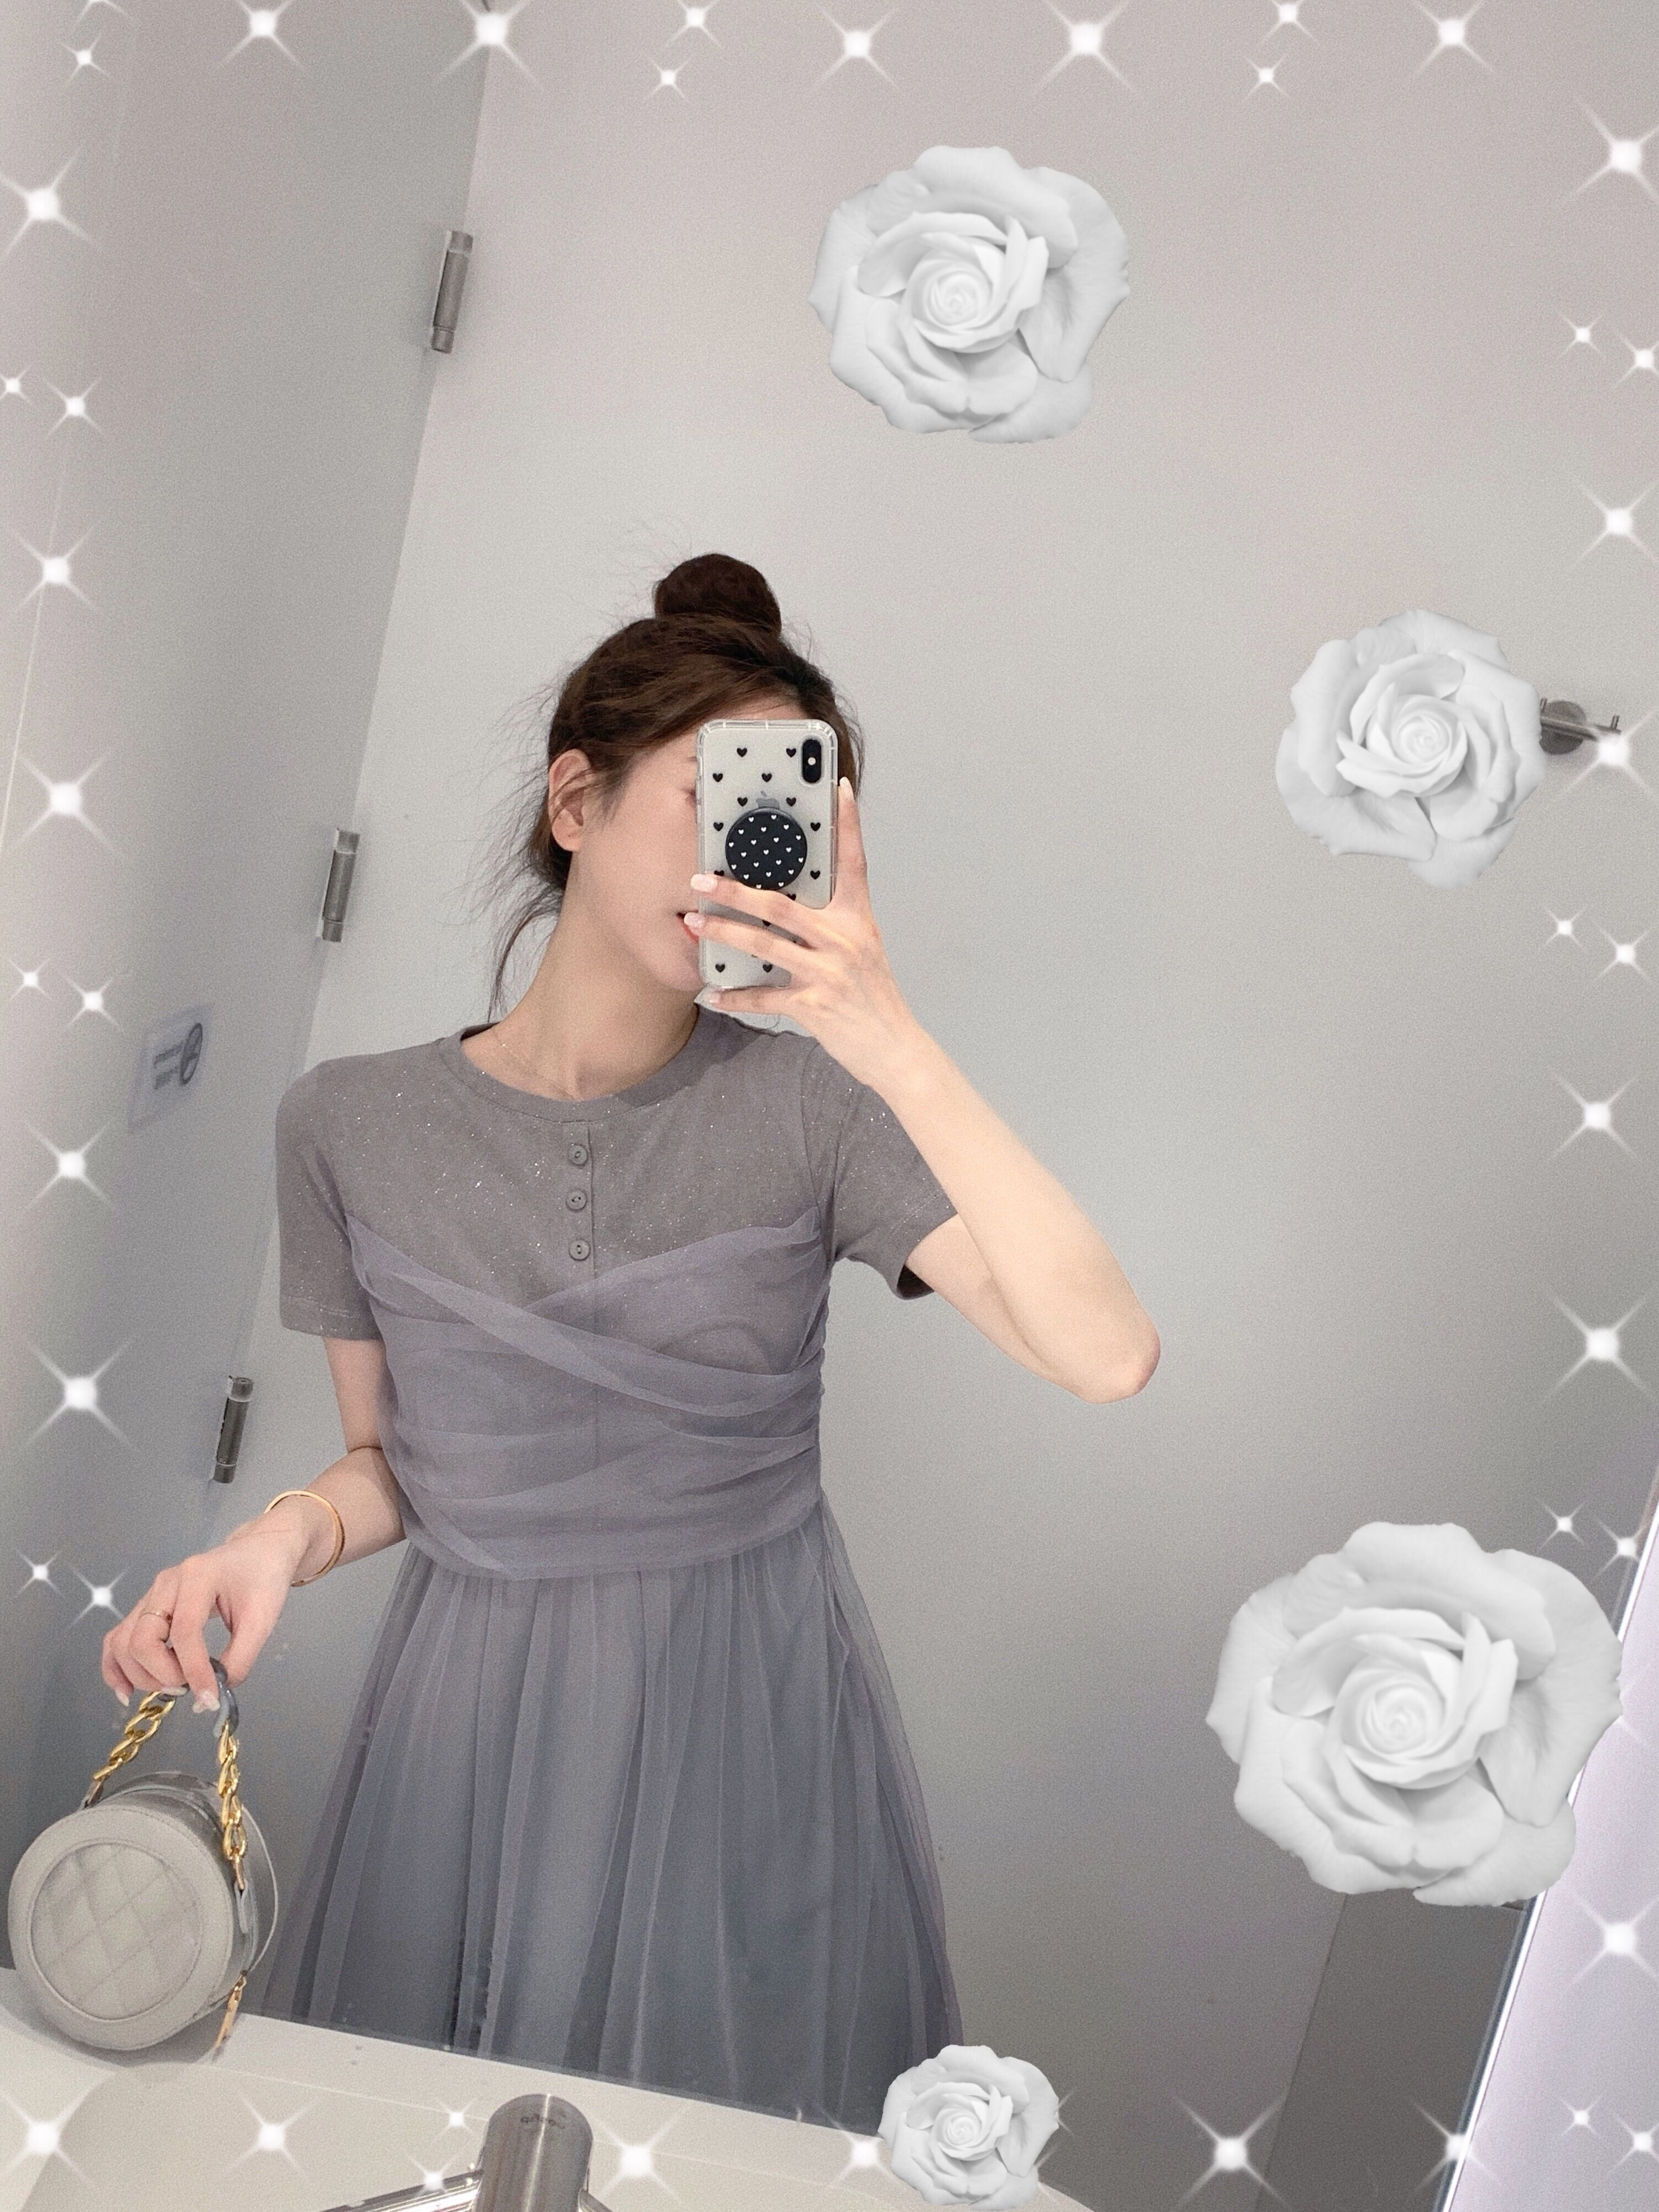 rouwanbaby肉完法式夏季甜美连衣裙11-03新券